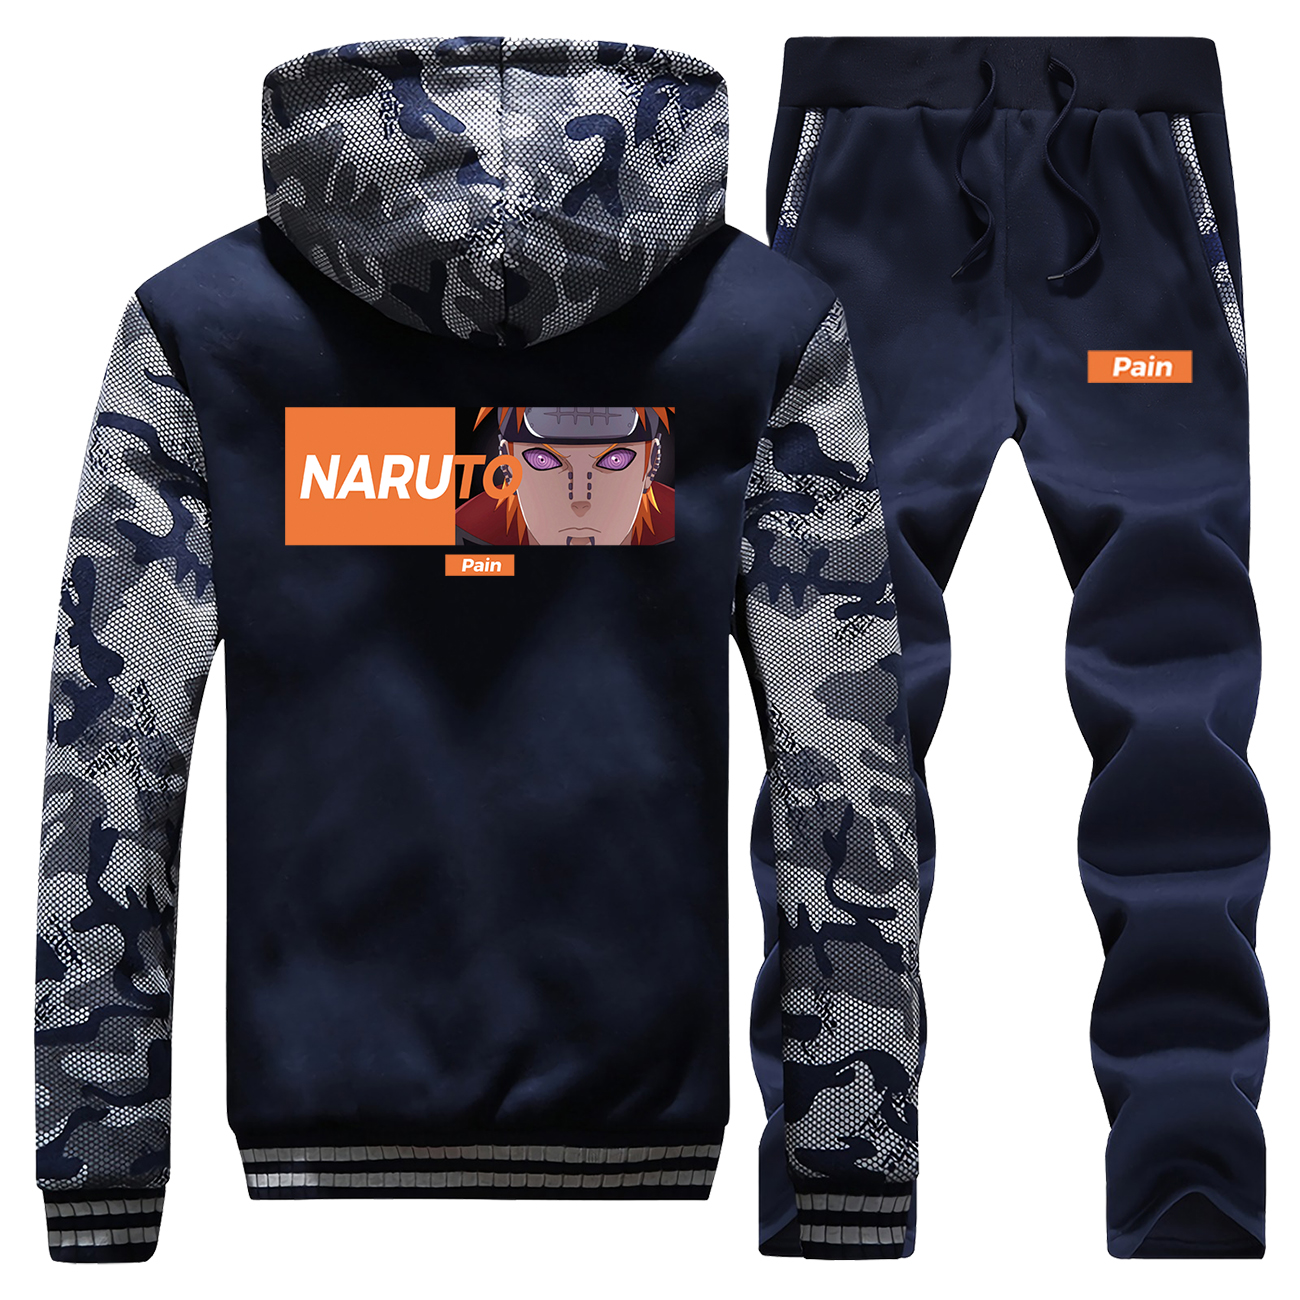 Hot Sale Winter Hoodies Mens Fleece Warm Jackets Camouflage Suit Naruto Japan Anime Streetwear Coat Thick + Pants 2 Piece Set